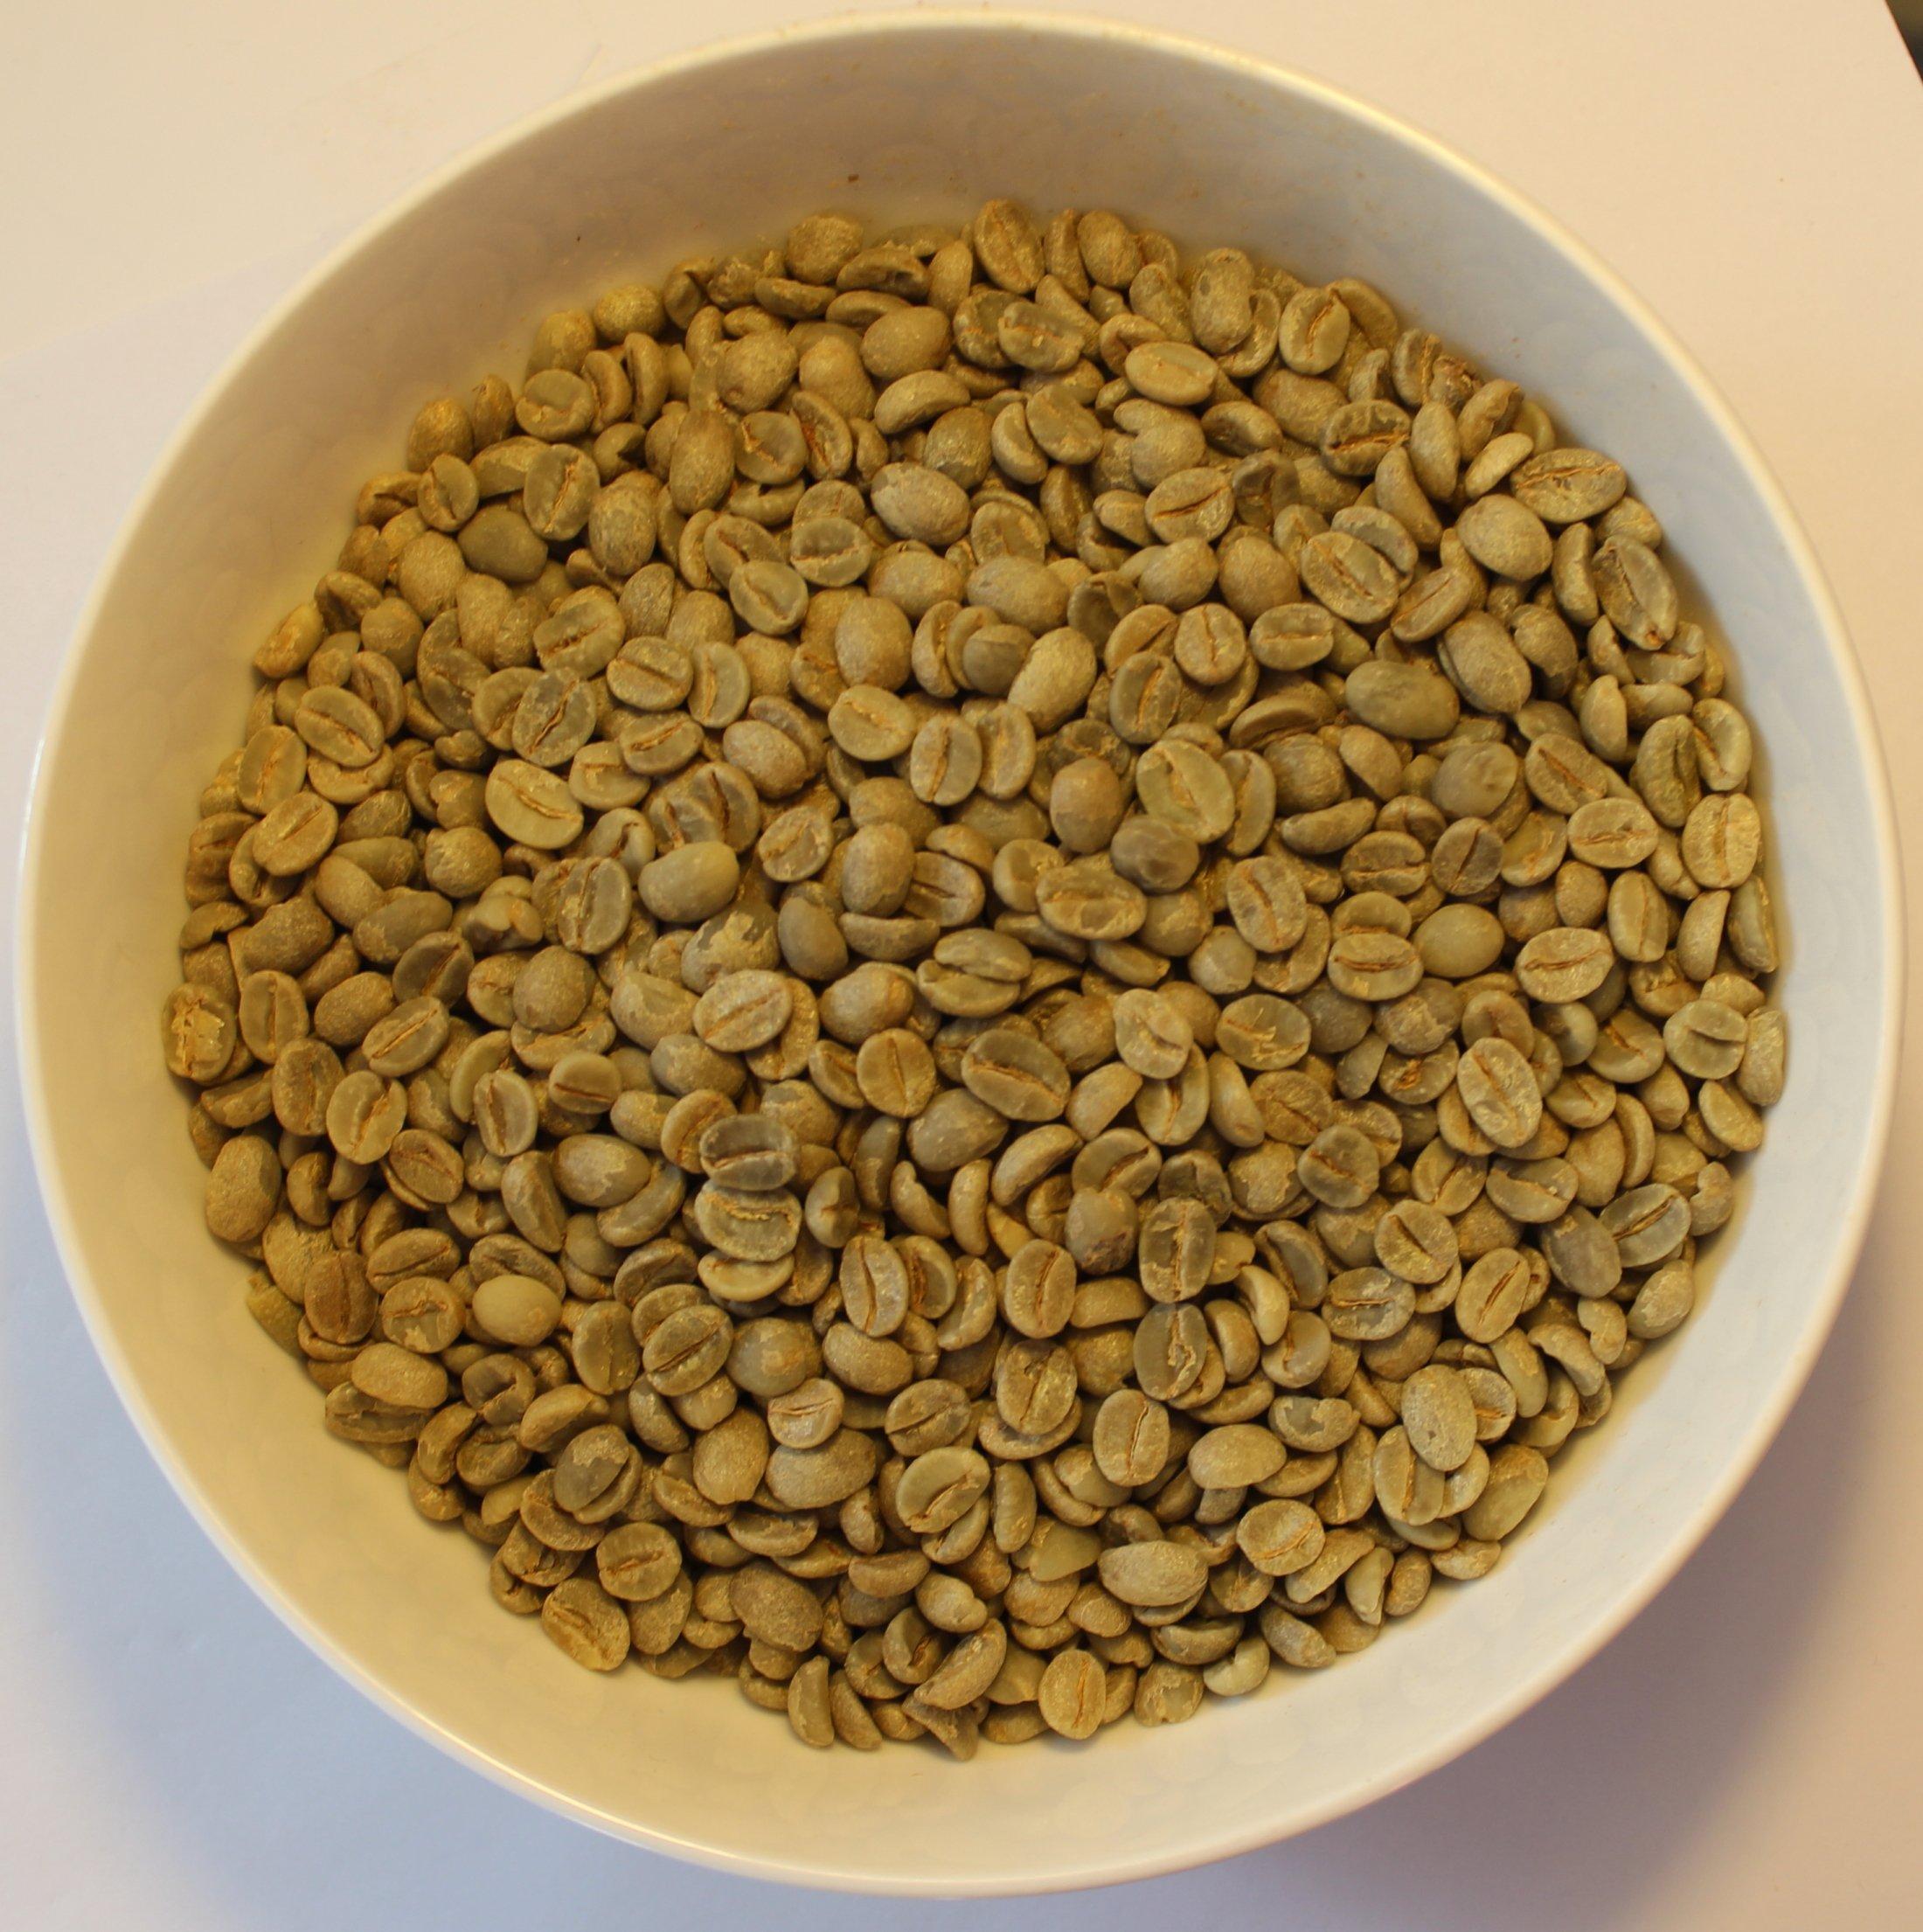 Brazil Frazenda Alta Vista ''Honey'' - Unroasted (Green) Coffee Beans - Fresh Crop (10 Pounds)